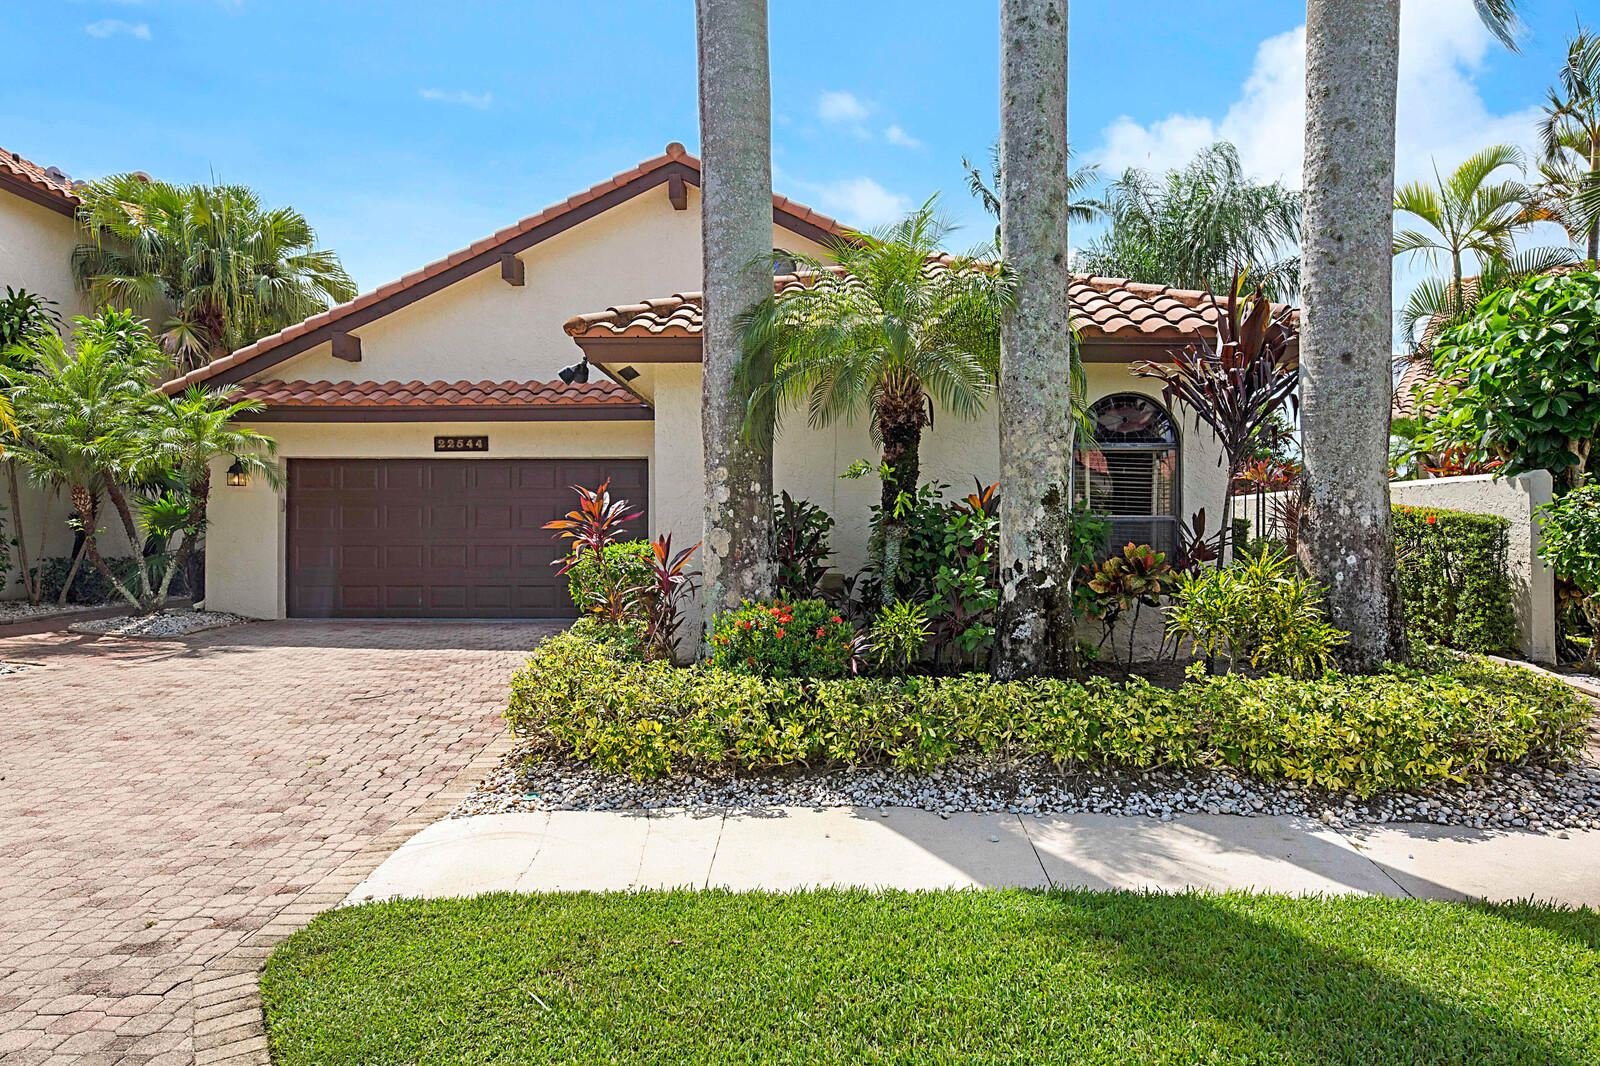 22544 Esplanada Circle W, Boca Raton, FL 33433 - #: RX-10655574